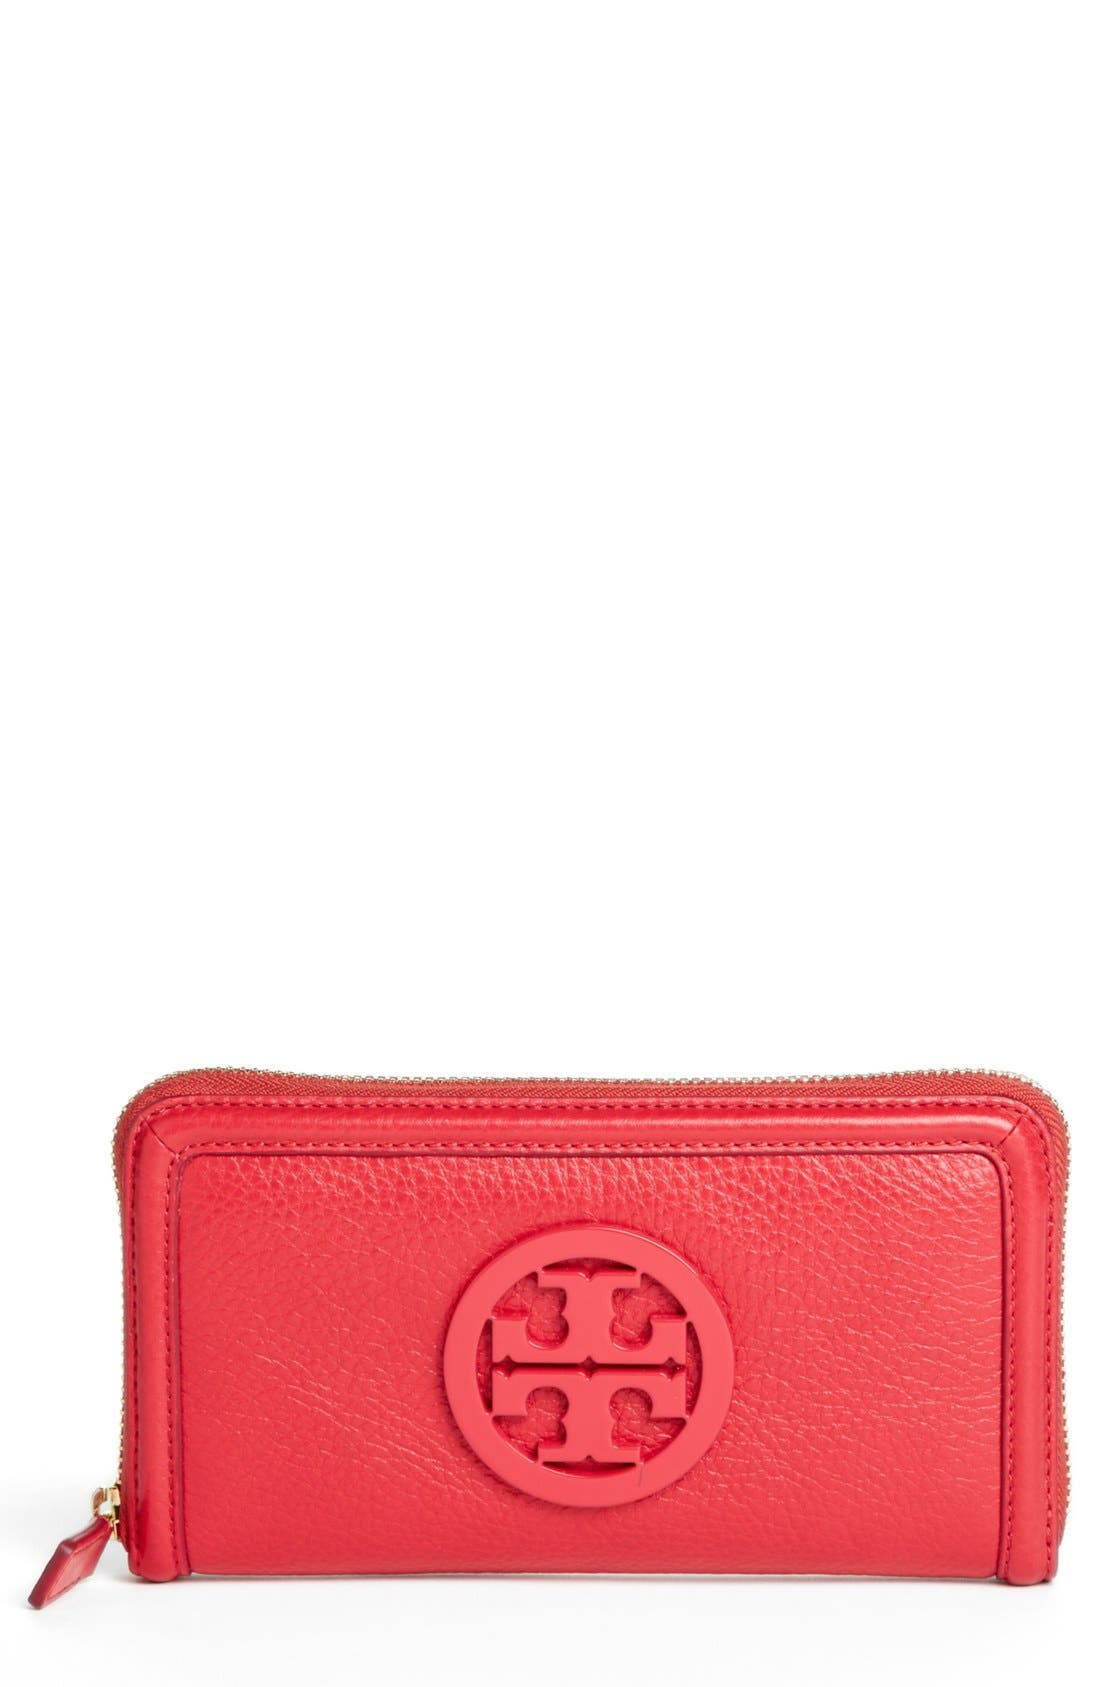 TORY BURCH 'Amanda' Continental Wallet, Main, color, 500